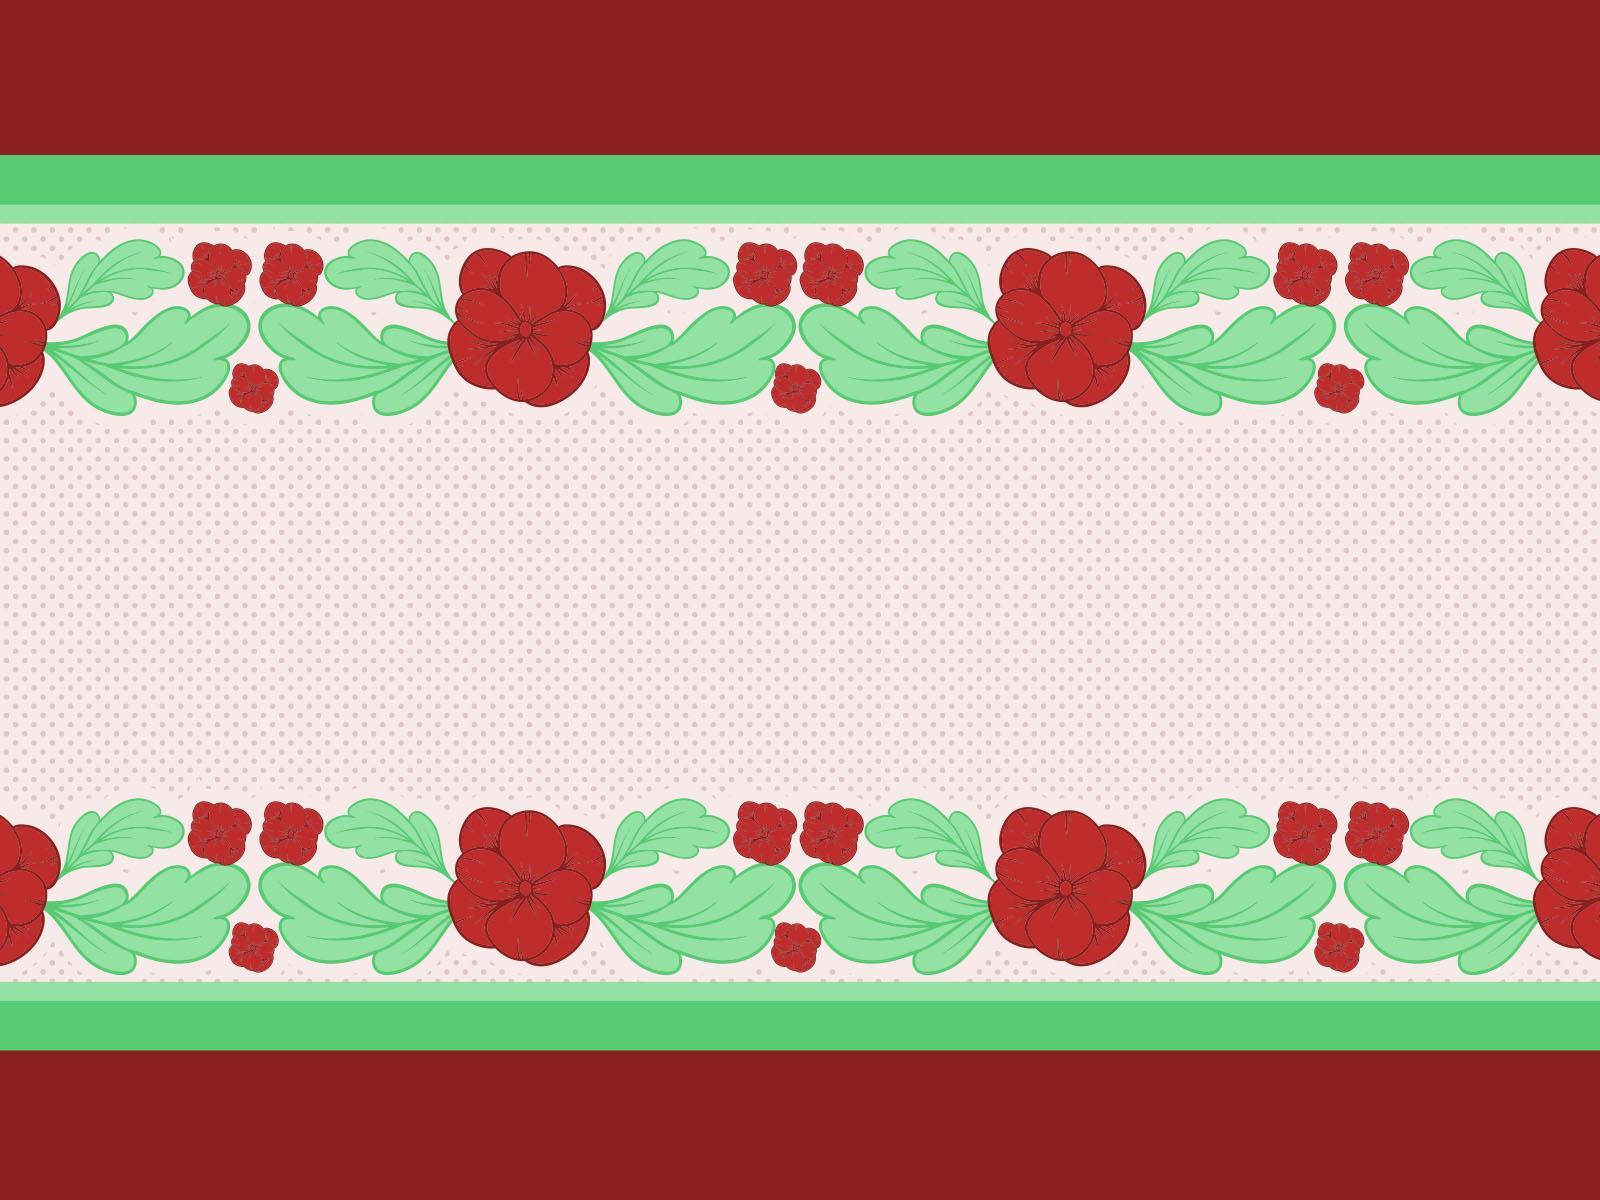 Flower Borders PPT Backgrounds